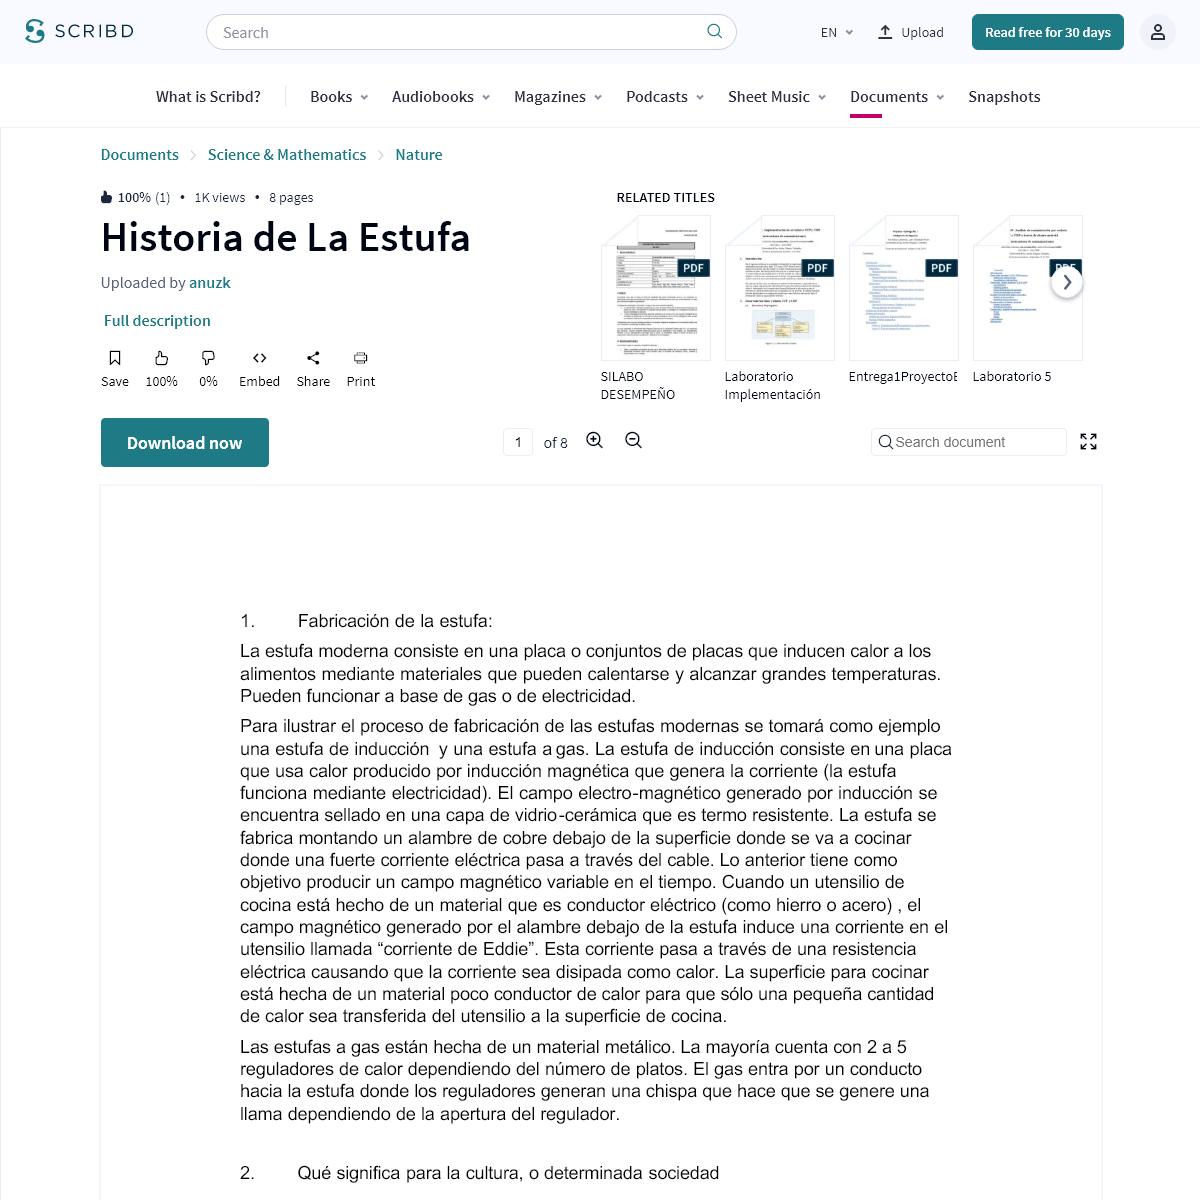 Historia de La Estufa - Estufa de cocina - Horno